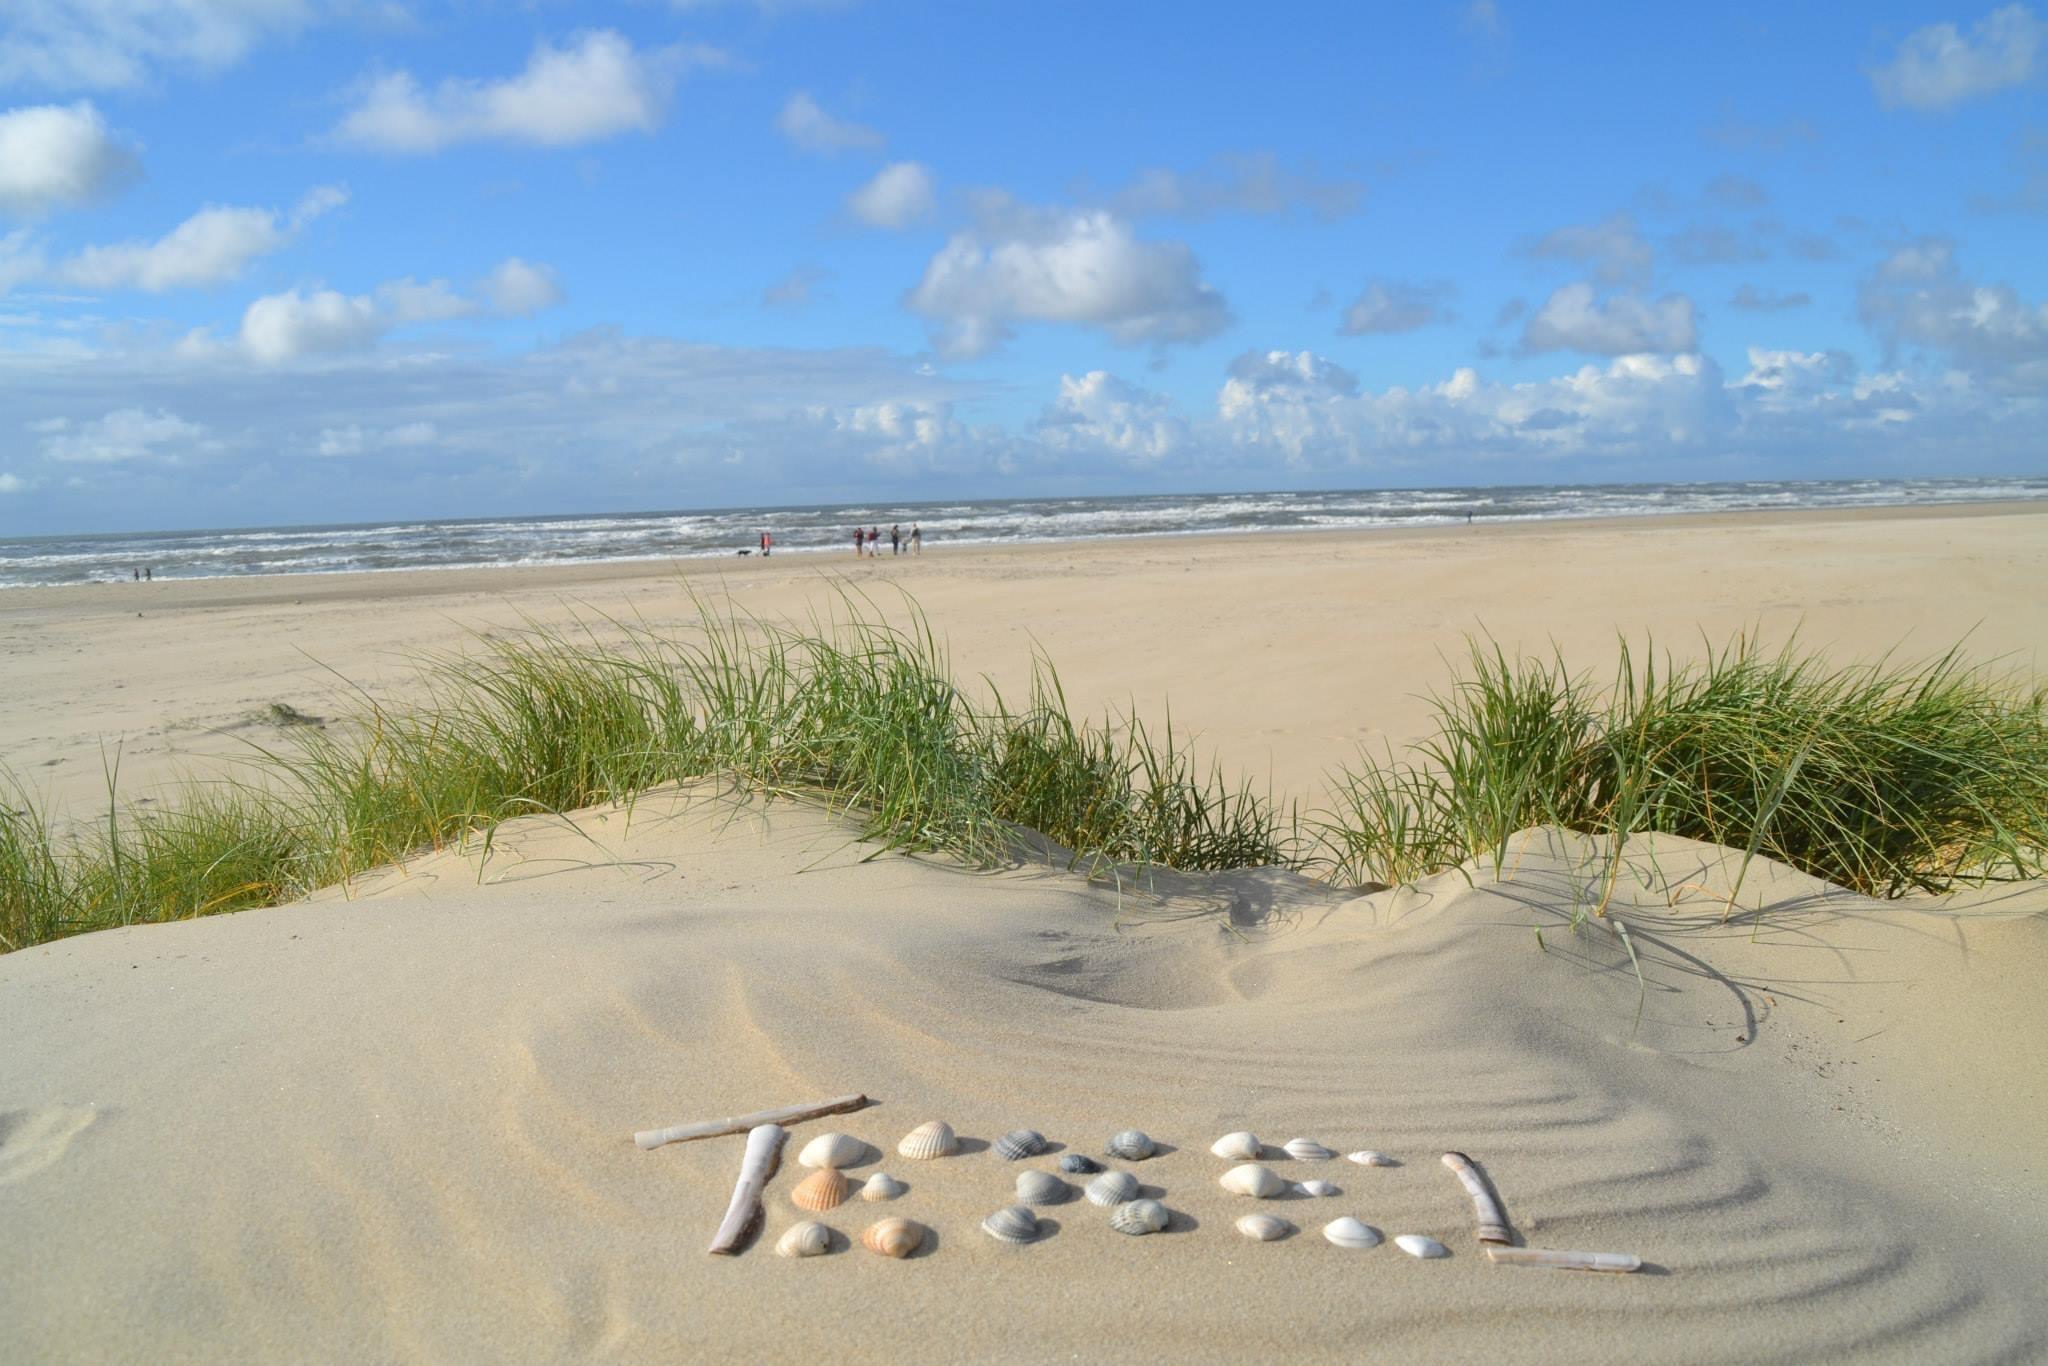 Letters Texel op het strand VVV Texel Sabrina Trenning